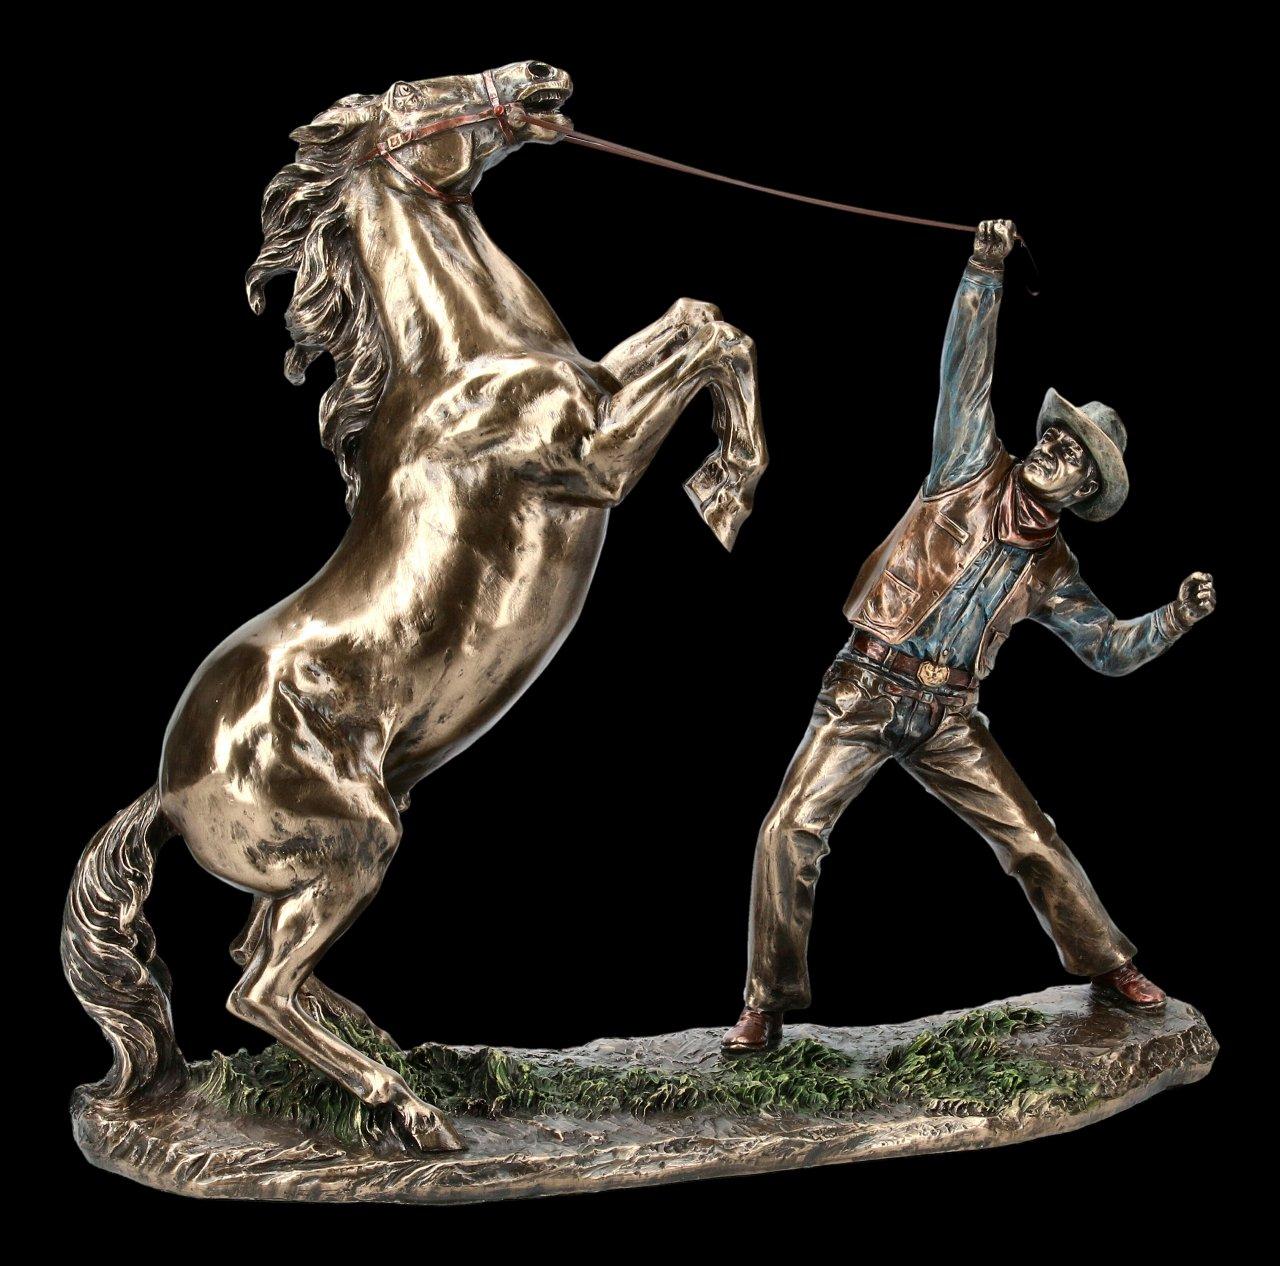 Cowboy Figurine - Wild Mustang